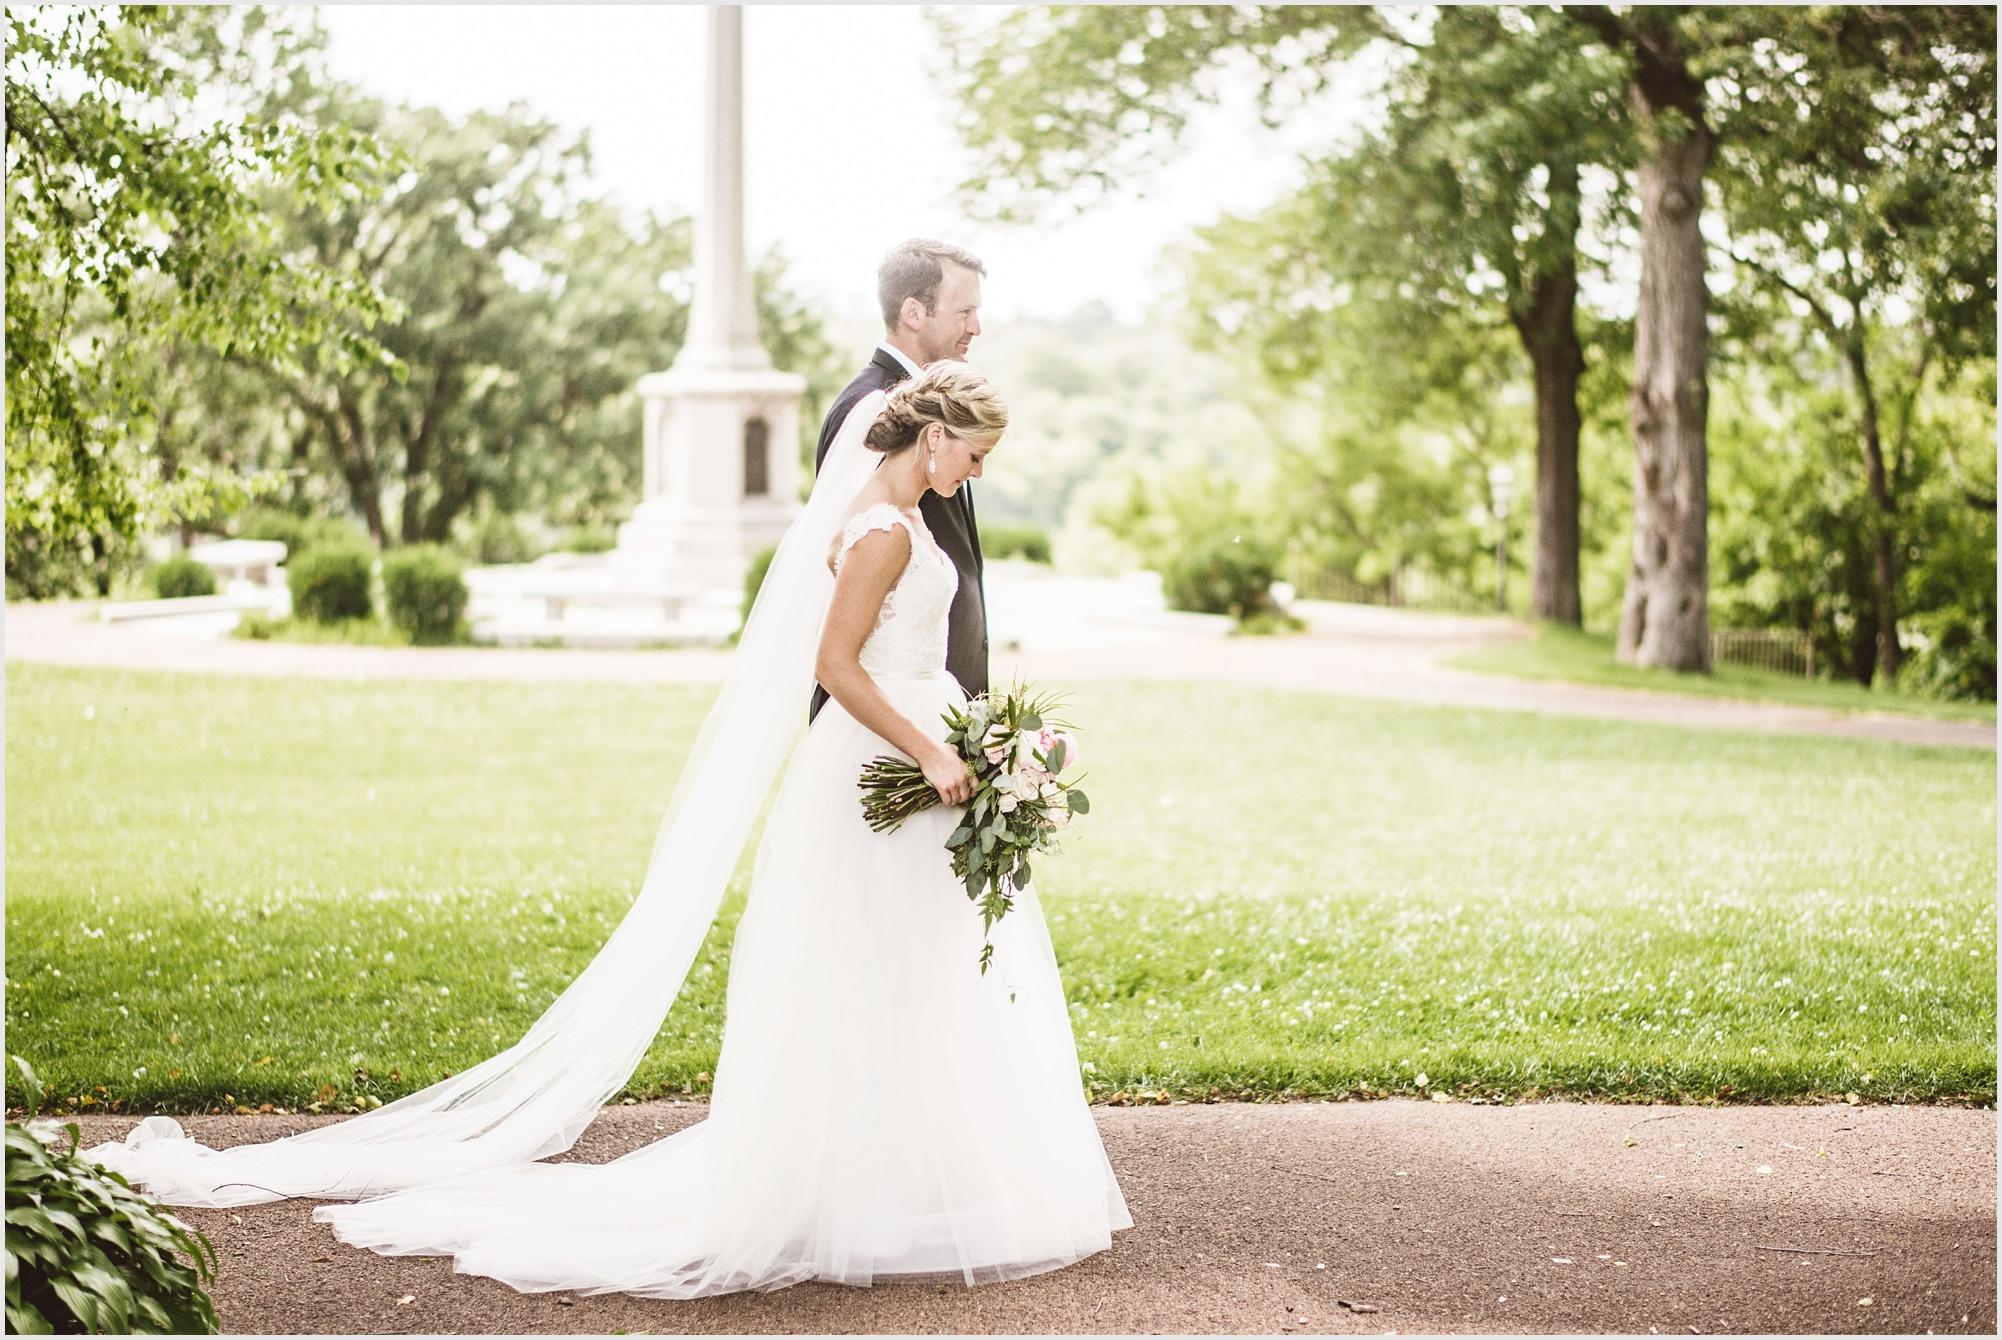 maura_david_james_j_hill_wedding_lucas_botz_photography_029.jpg